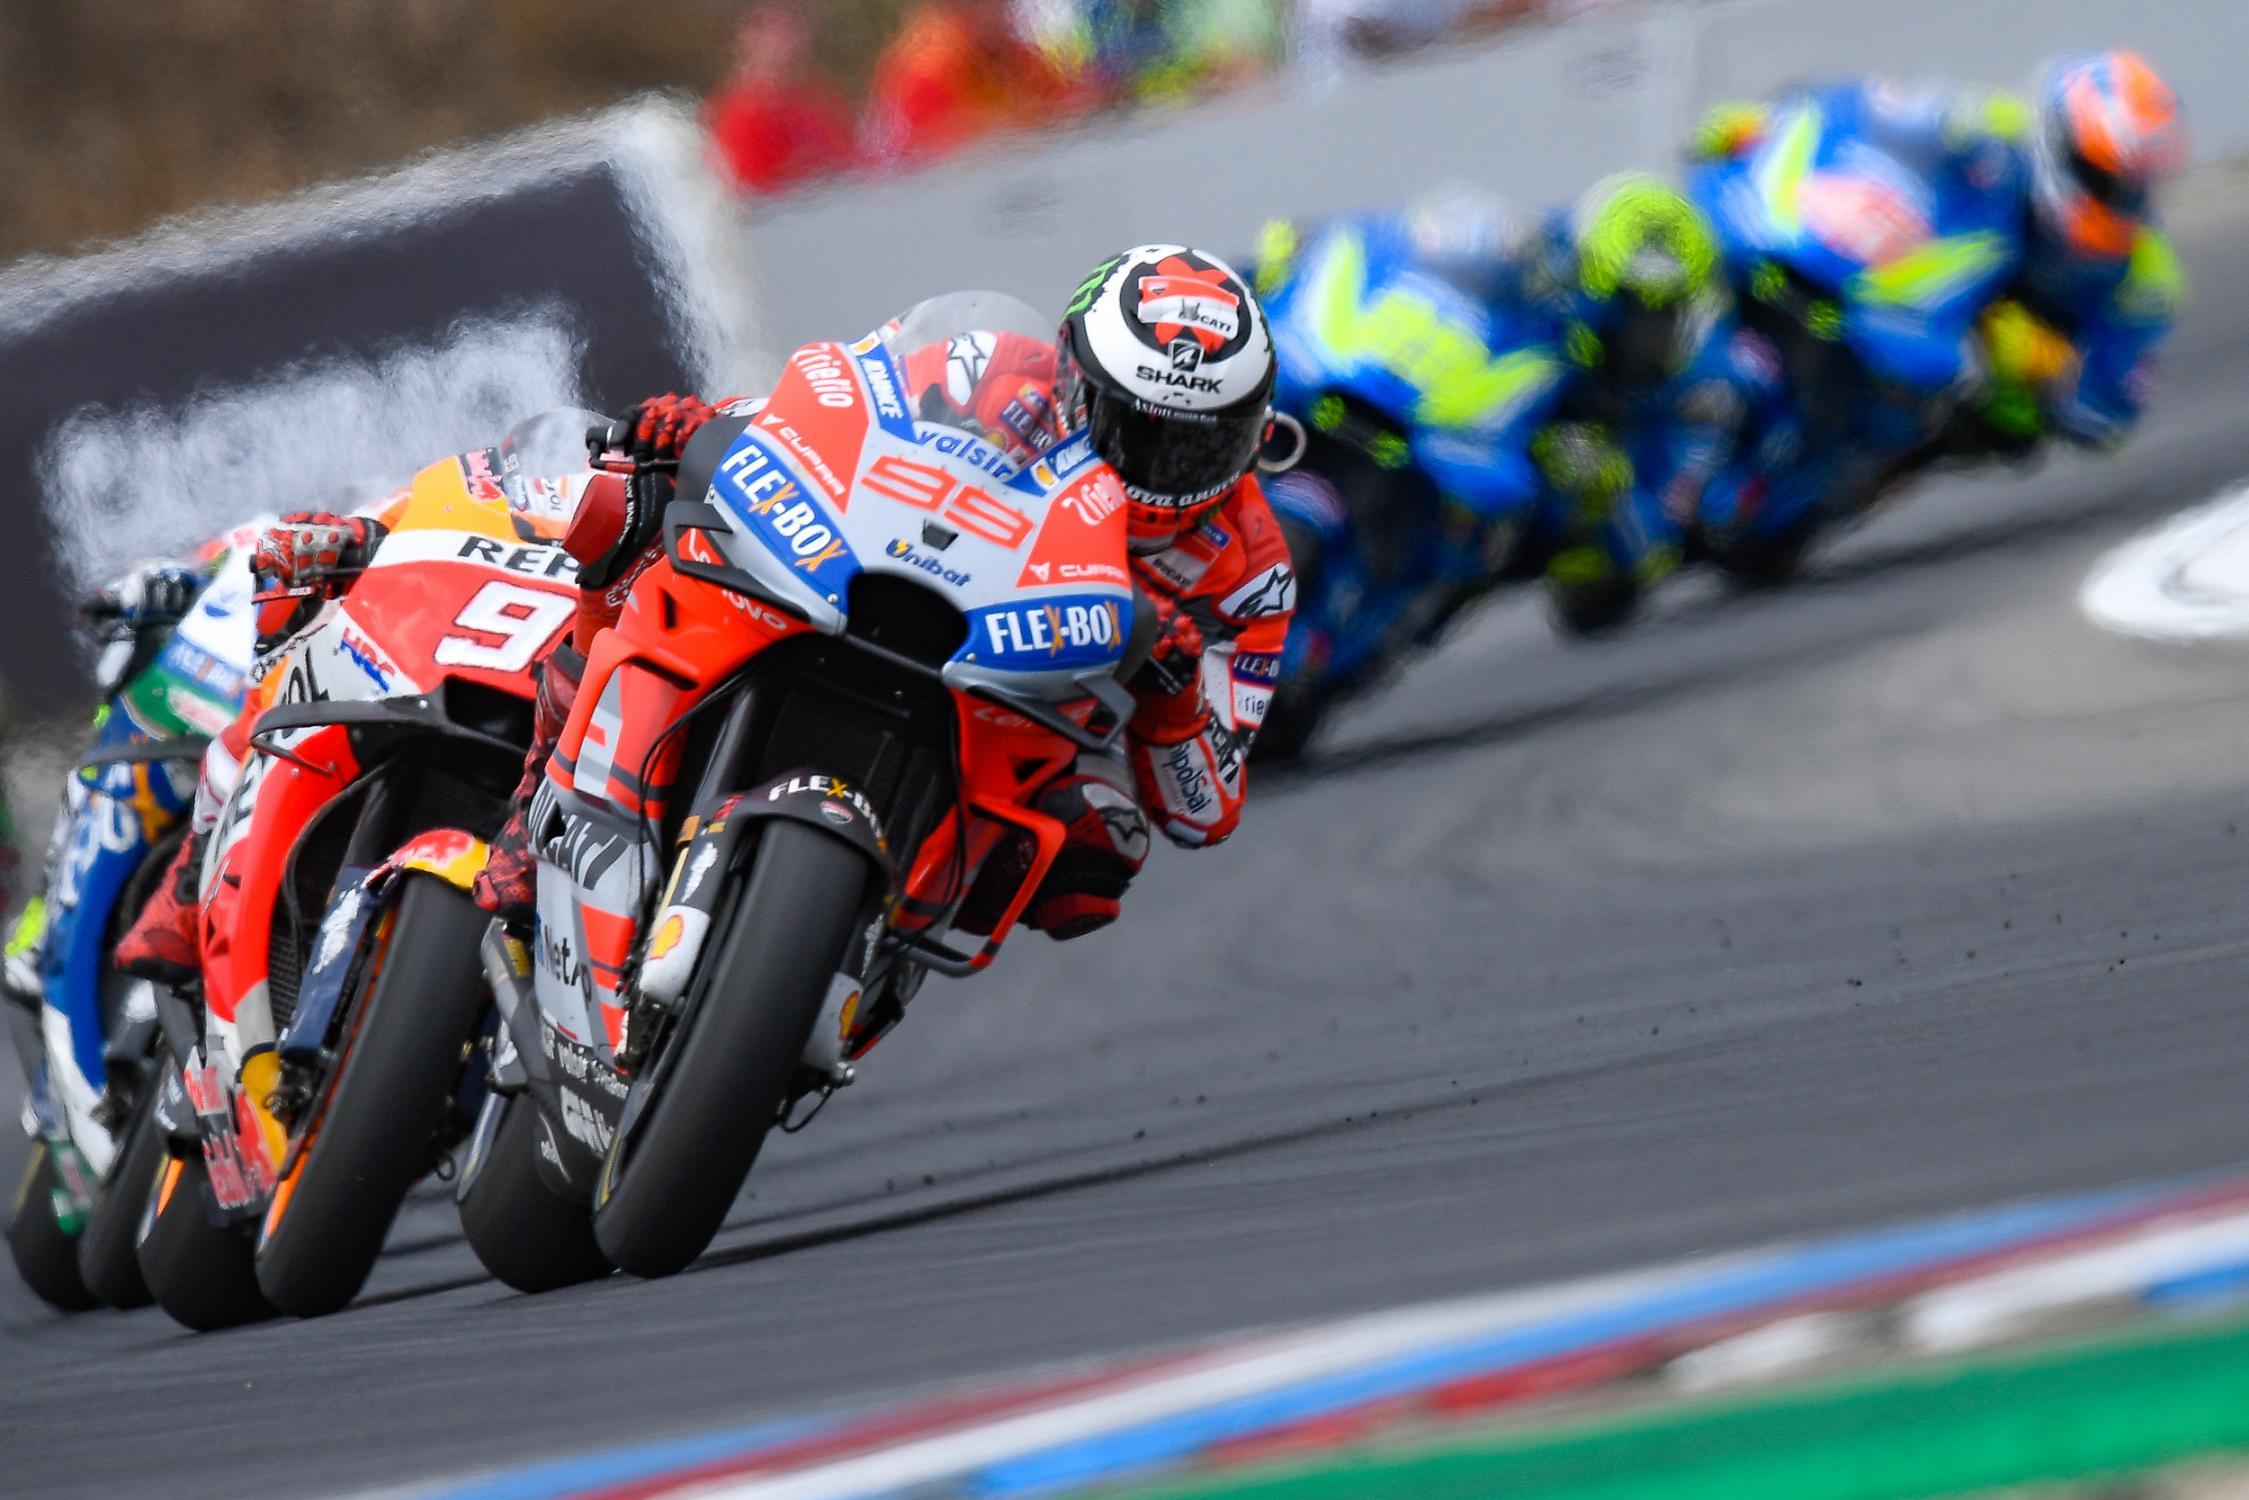 [GP] Brno 99-jorge-lorenzo-esp_ds51801.gallery_full_top_fullscreen